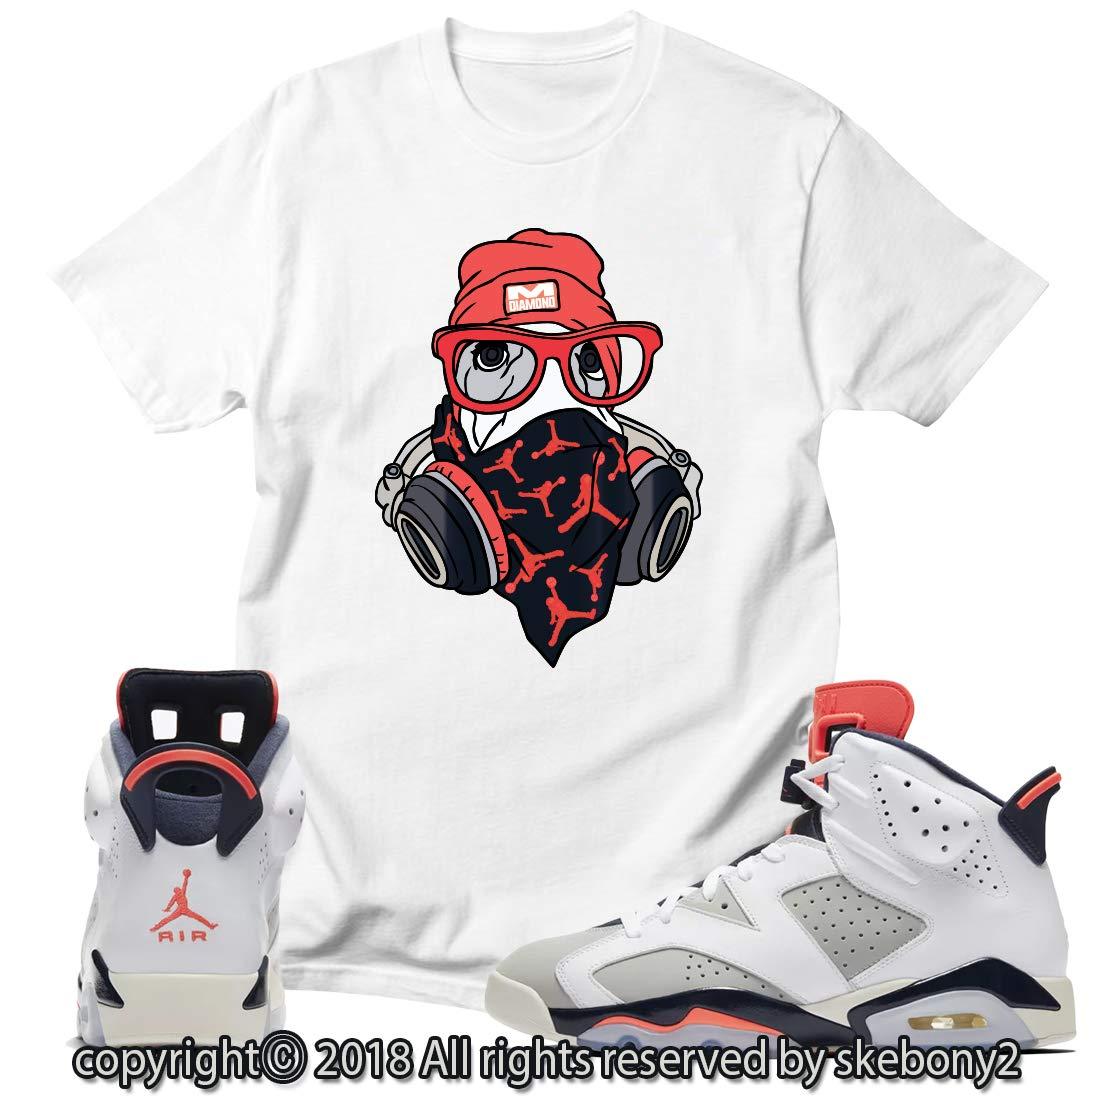 df6a9b11a3c Custom T Shirt Matching Style of AIR Jordan 6 Infrared Tinker JD 6-10-6 at  Amazon Men's Clothing store: